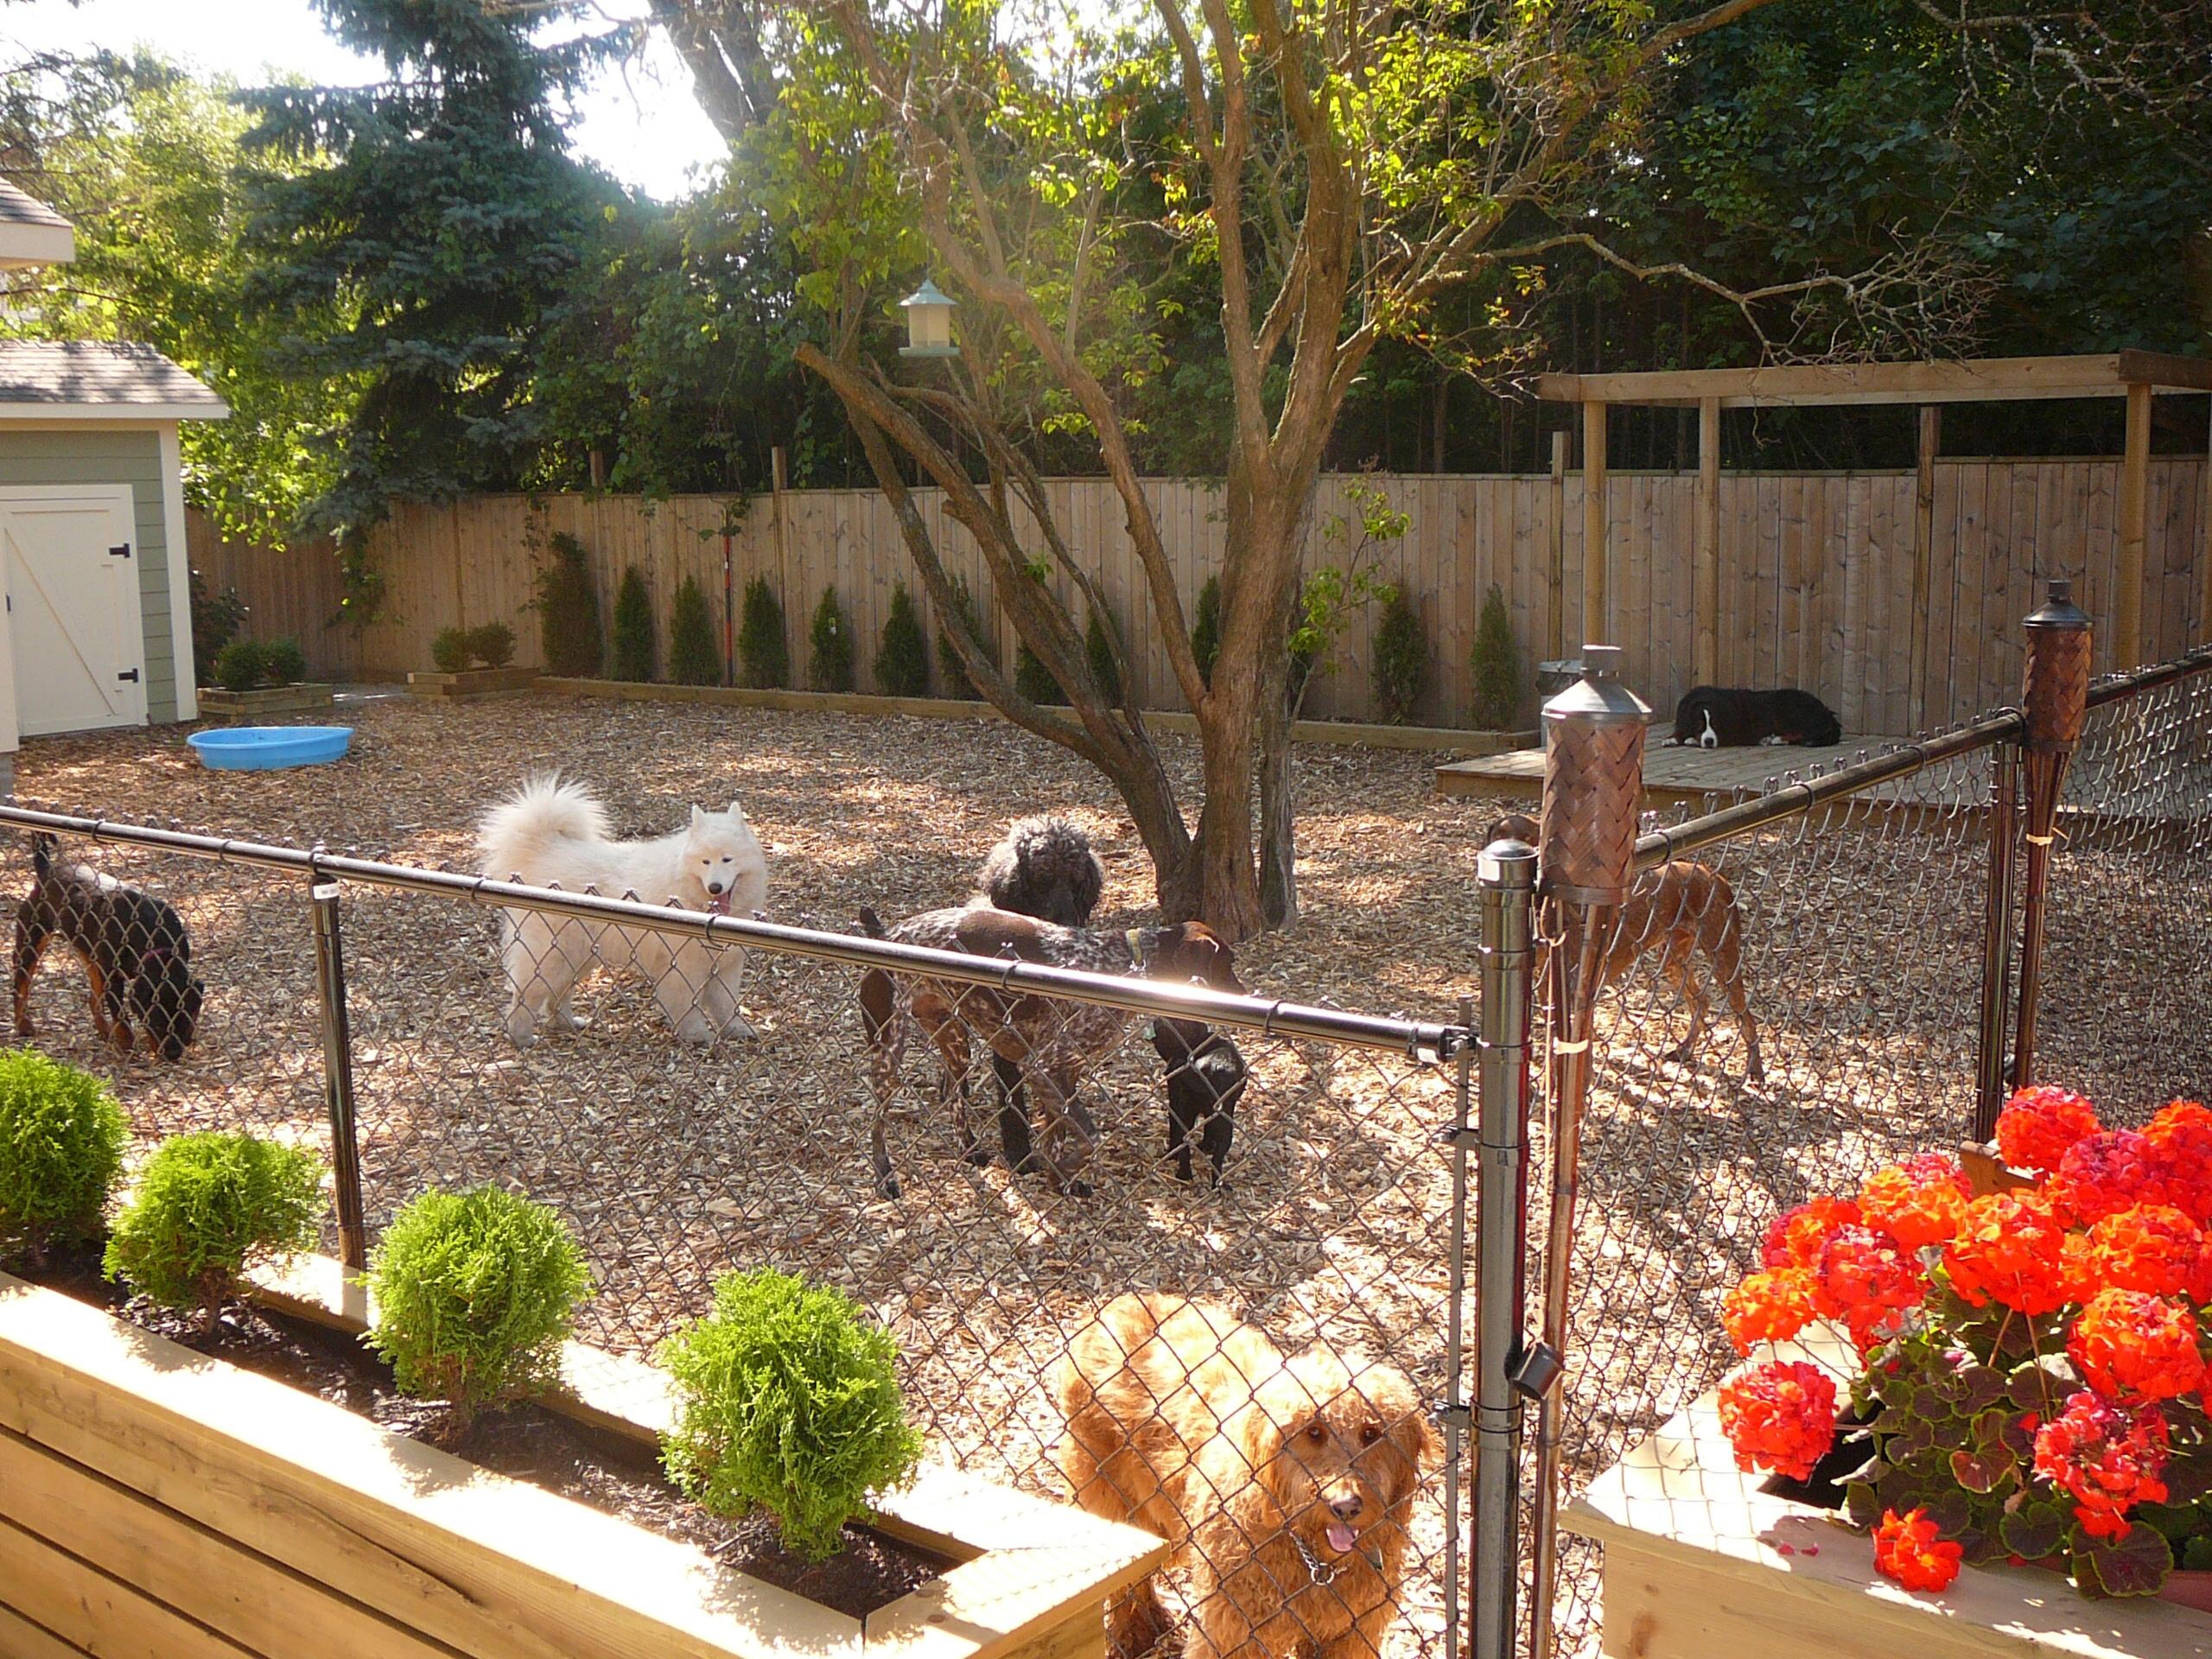 Garden Design For Dogs perfect garden design for dogs inspiration decorating